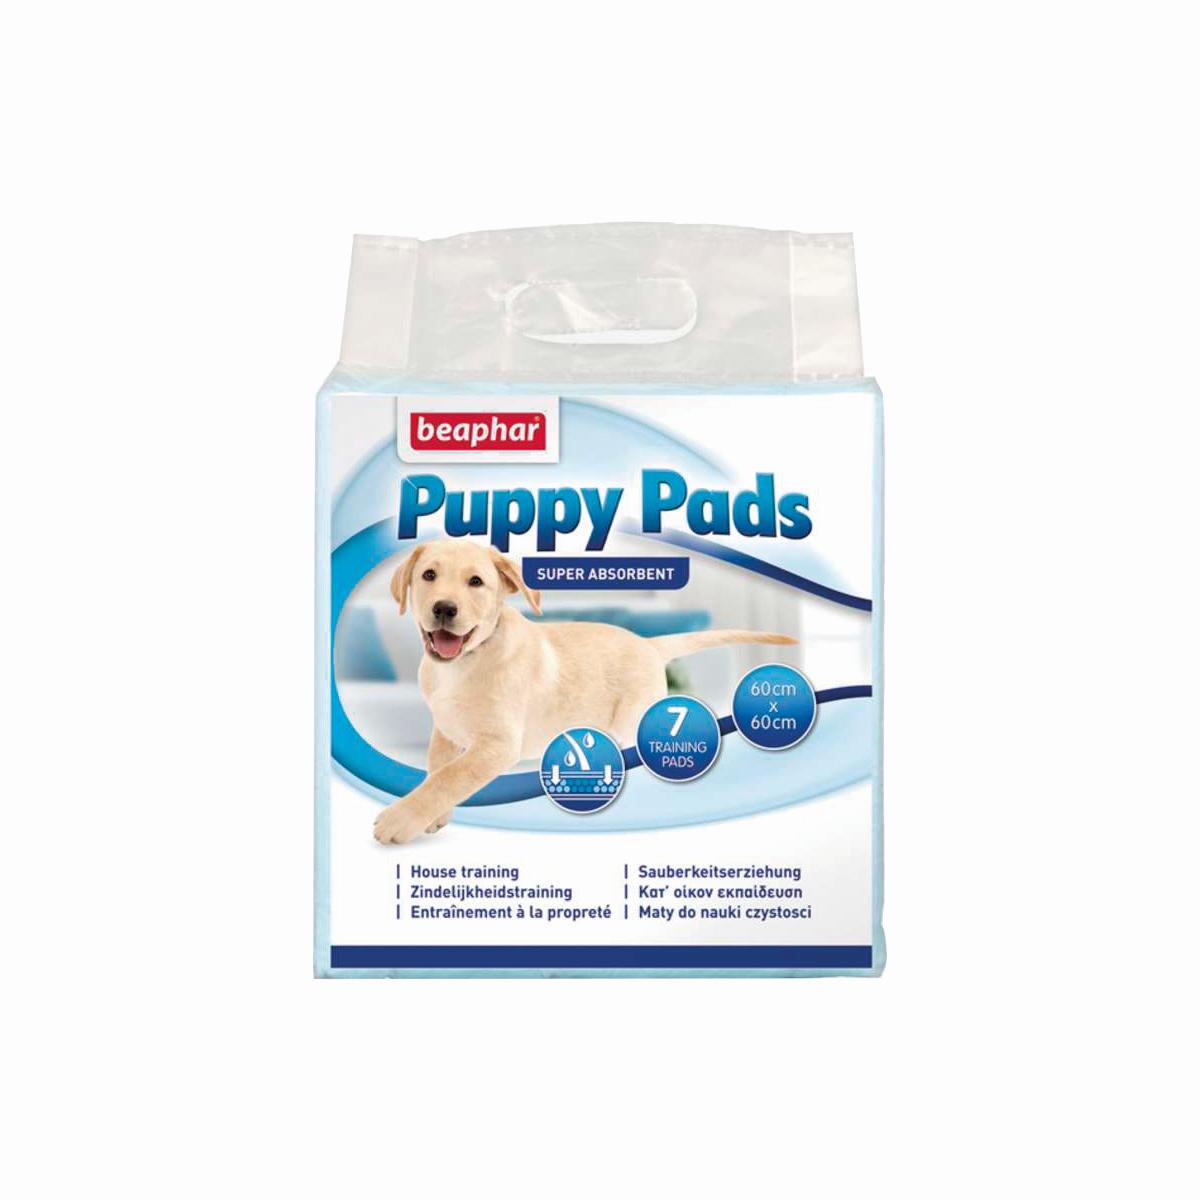 Beaphar puppypads